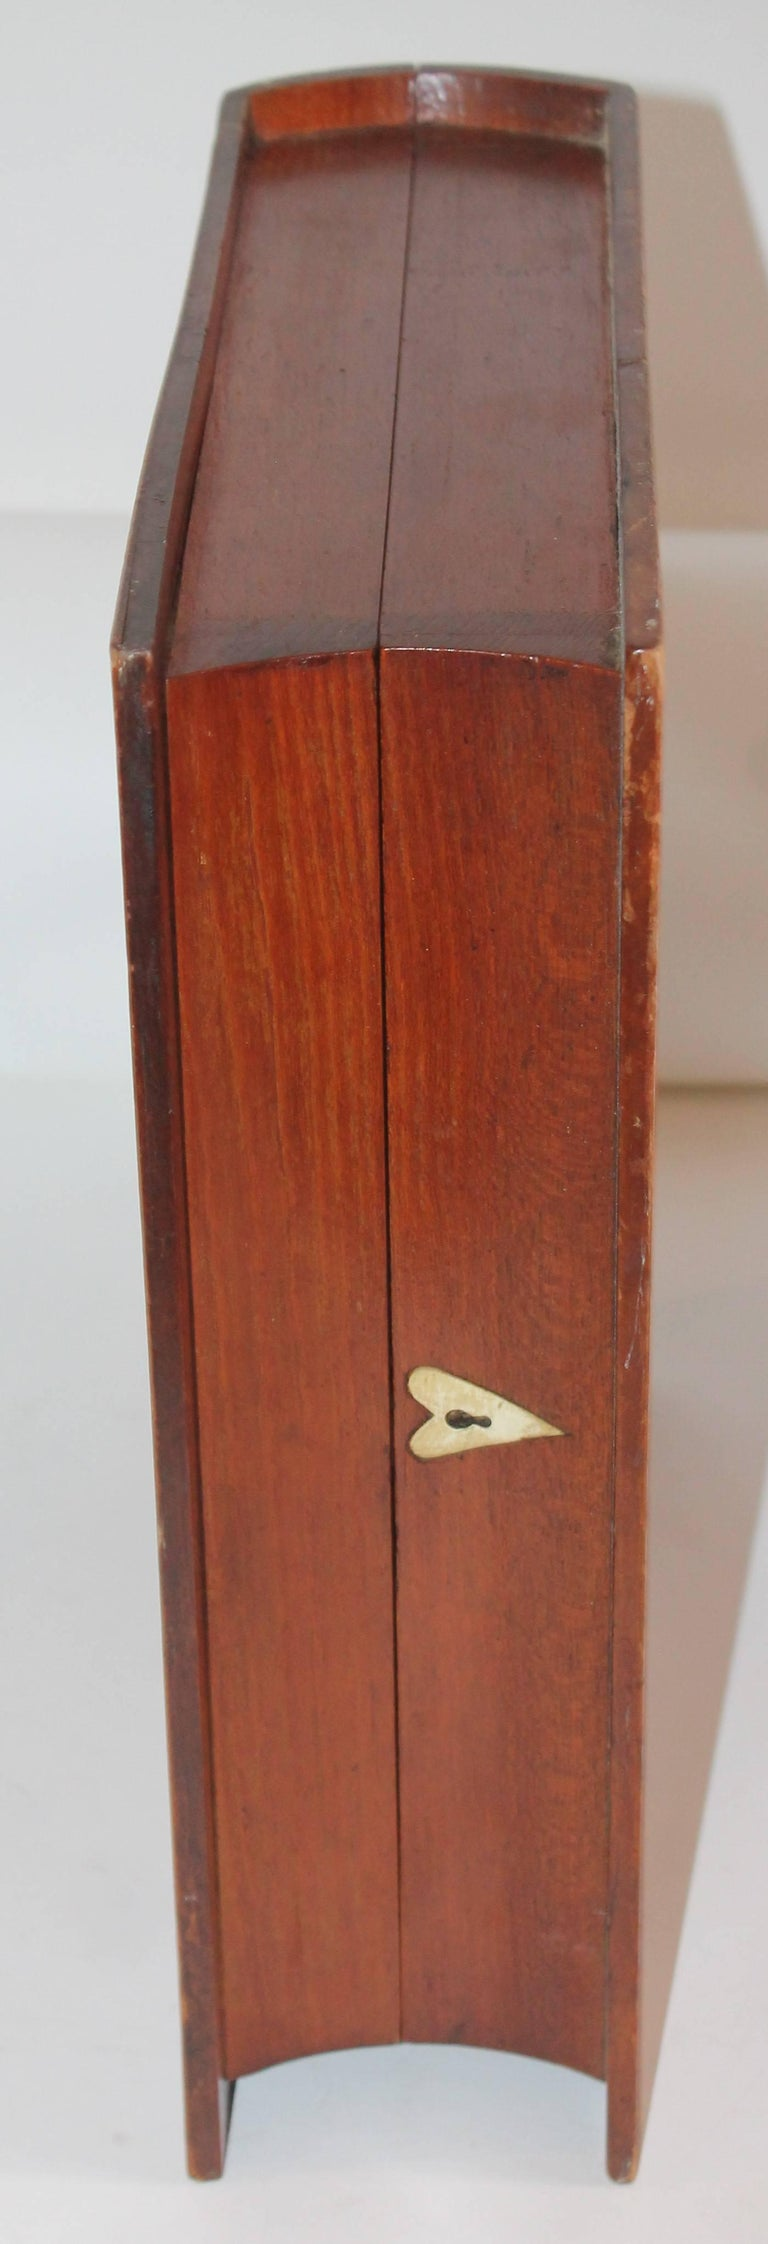 19th Century Folky Inlaid Bible Box 4